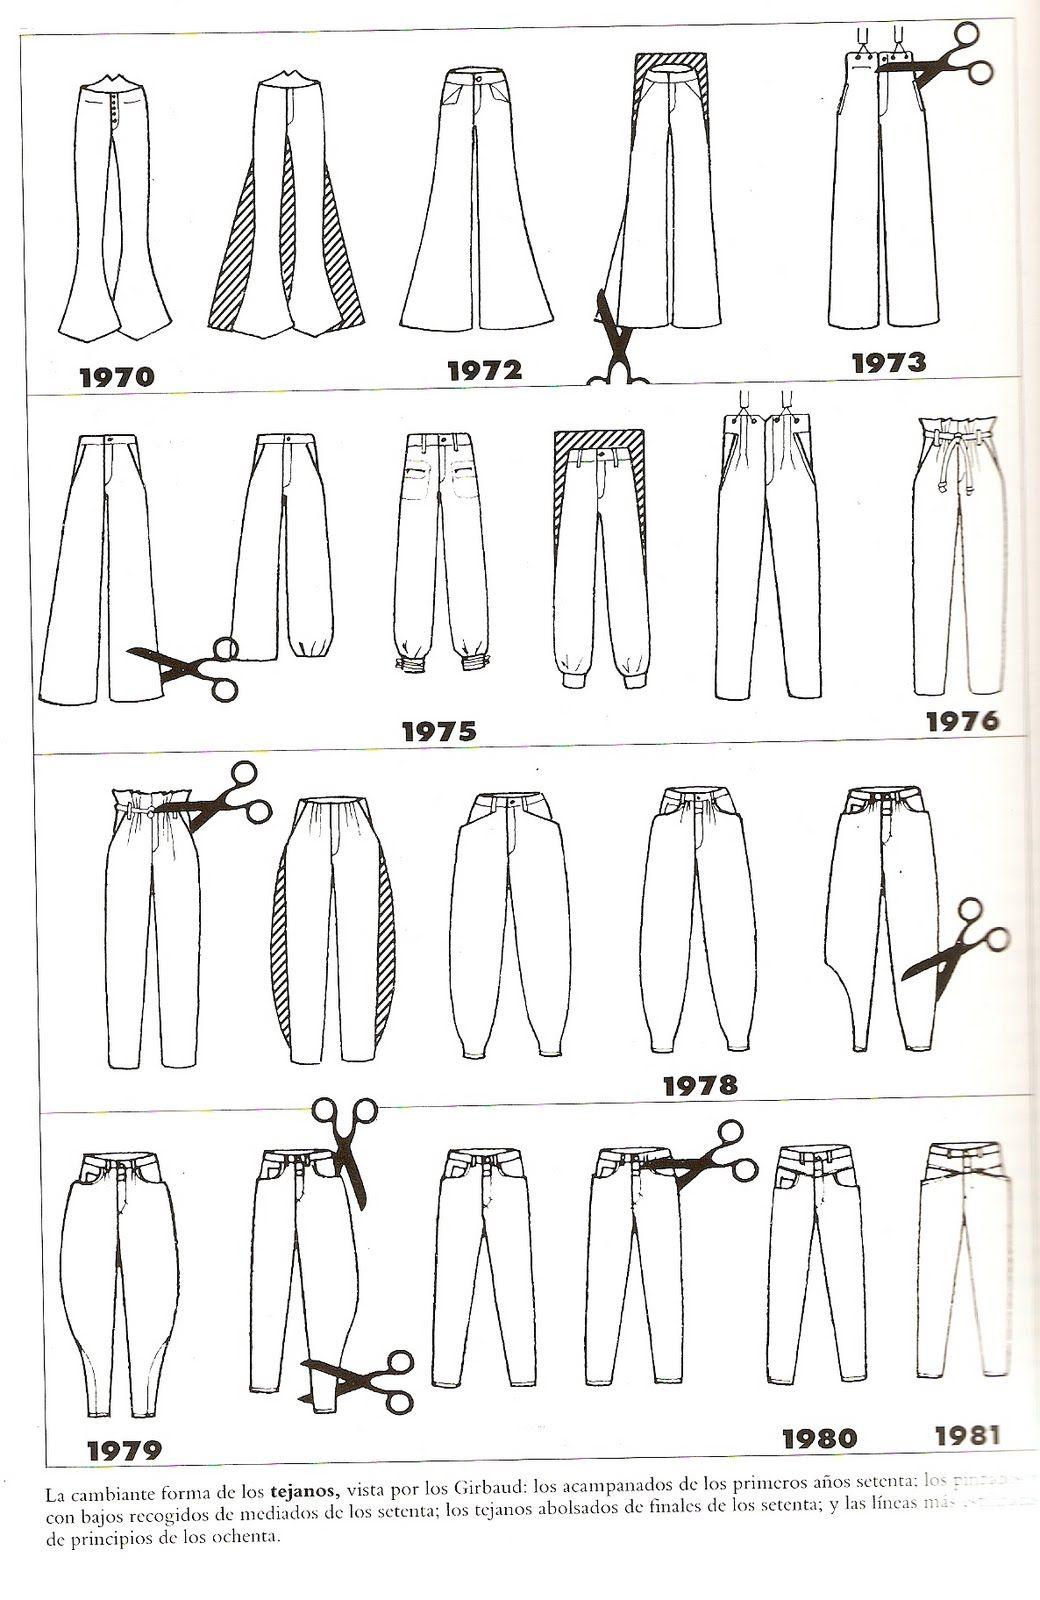 pantalones tejanos a través del tiempo   ropa   Pinterest ...